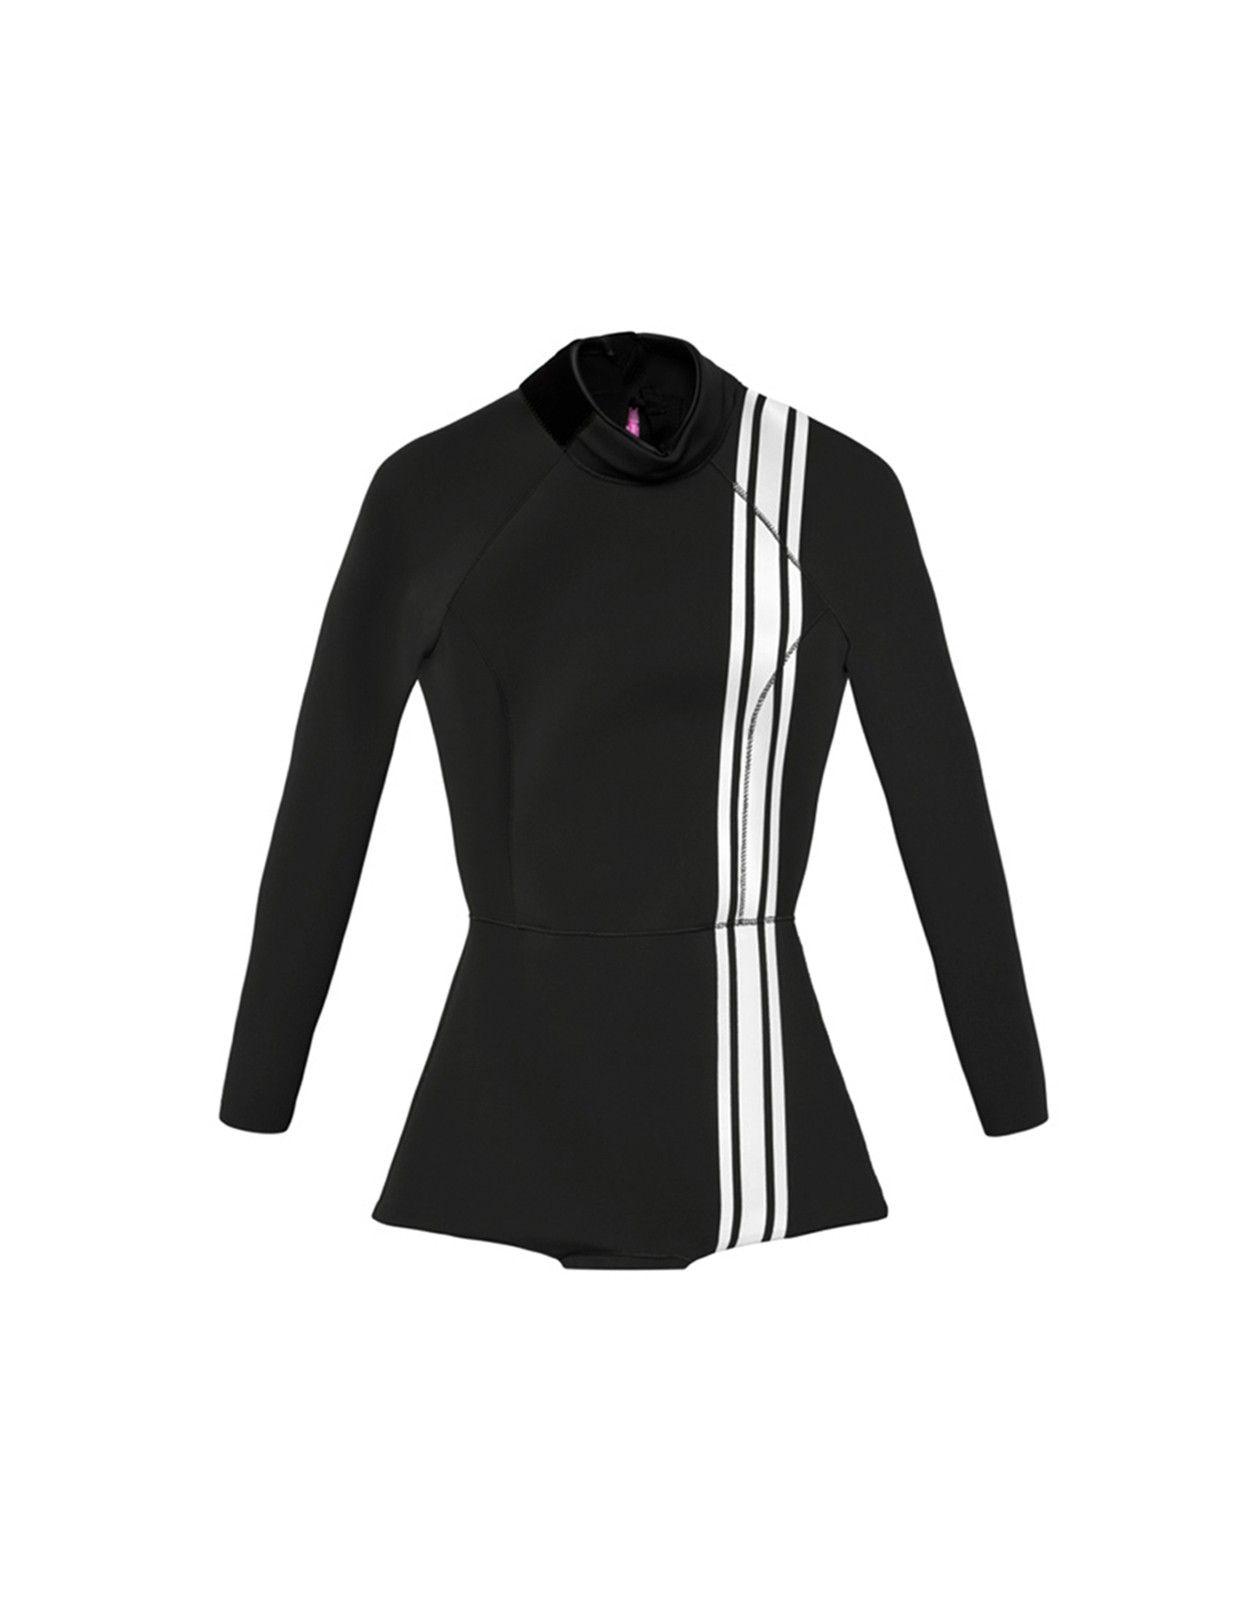 Cynthia Rowley - Athletic Stripe Wetsuit